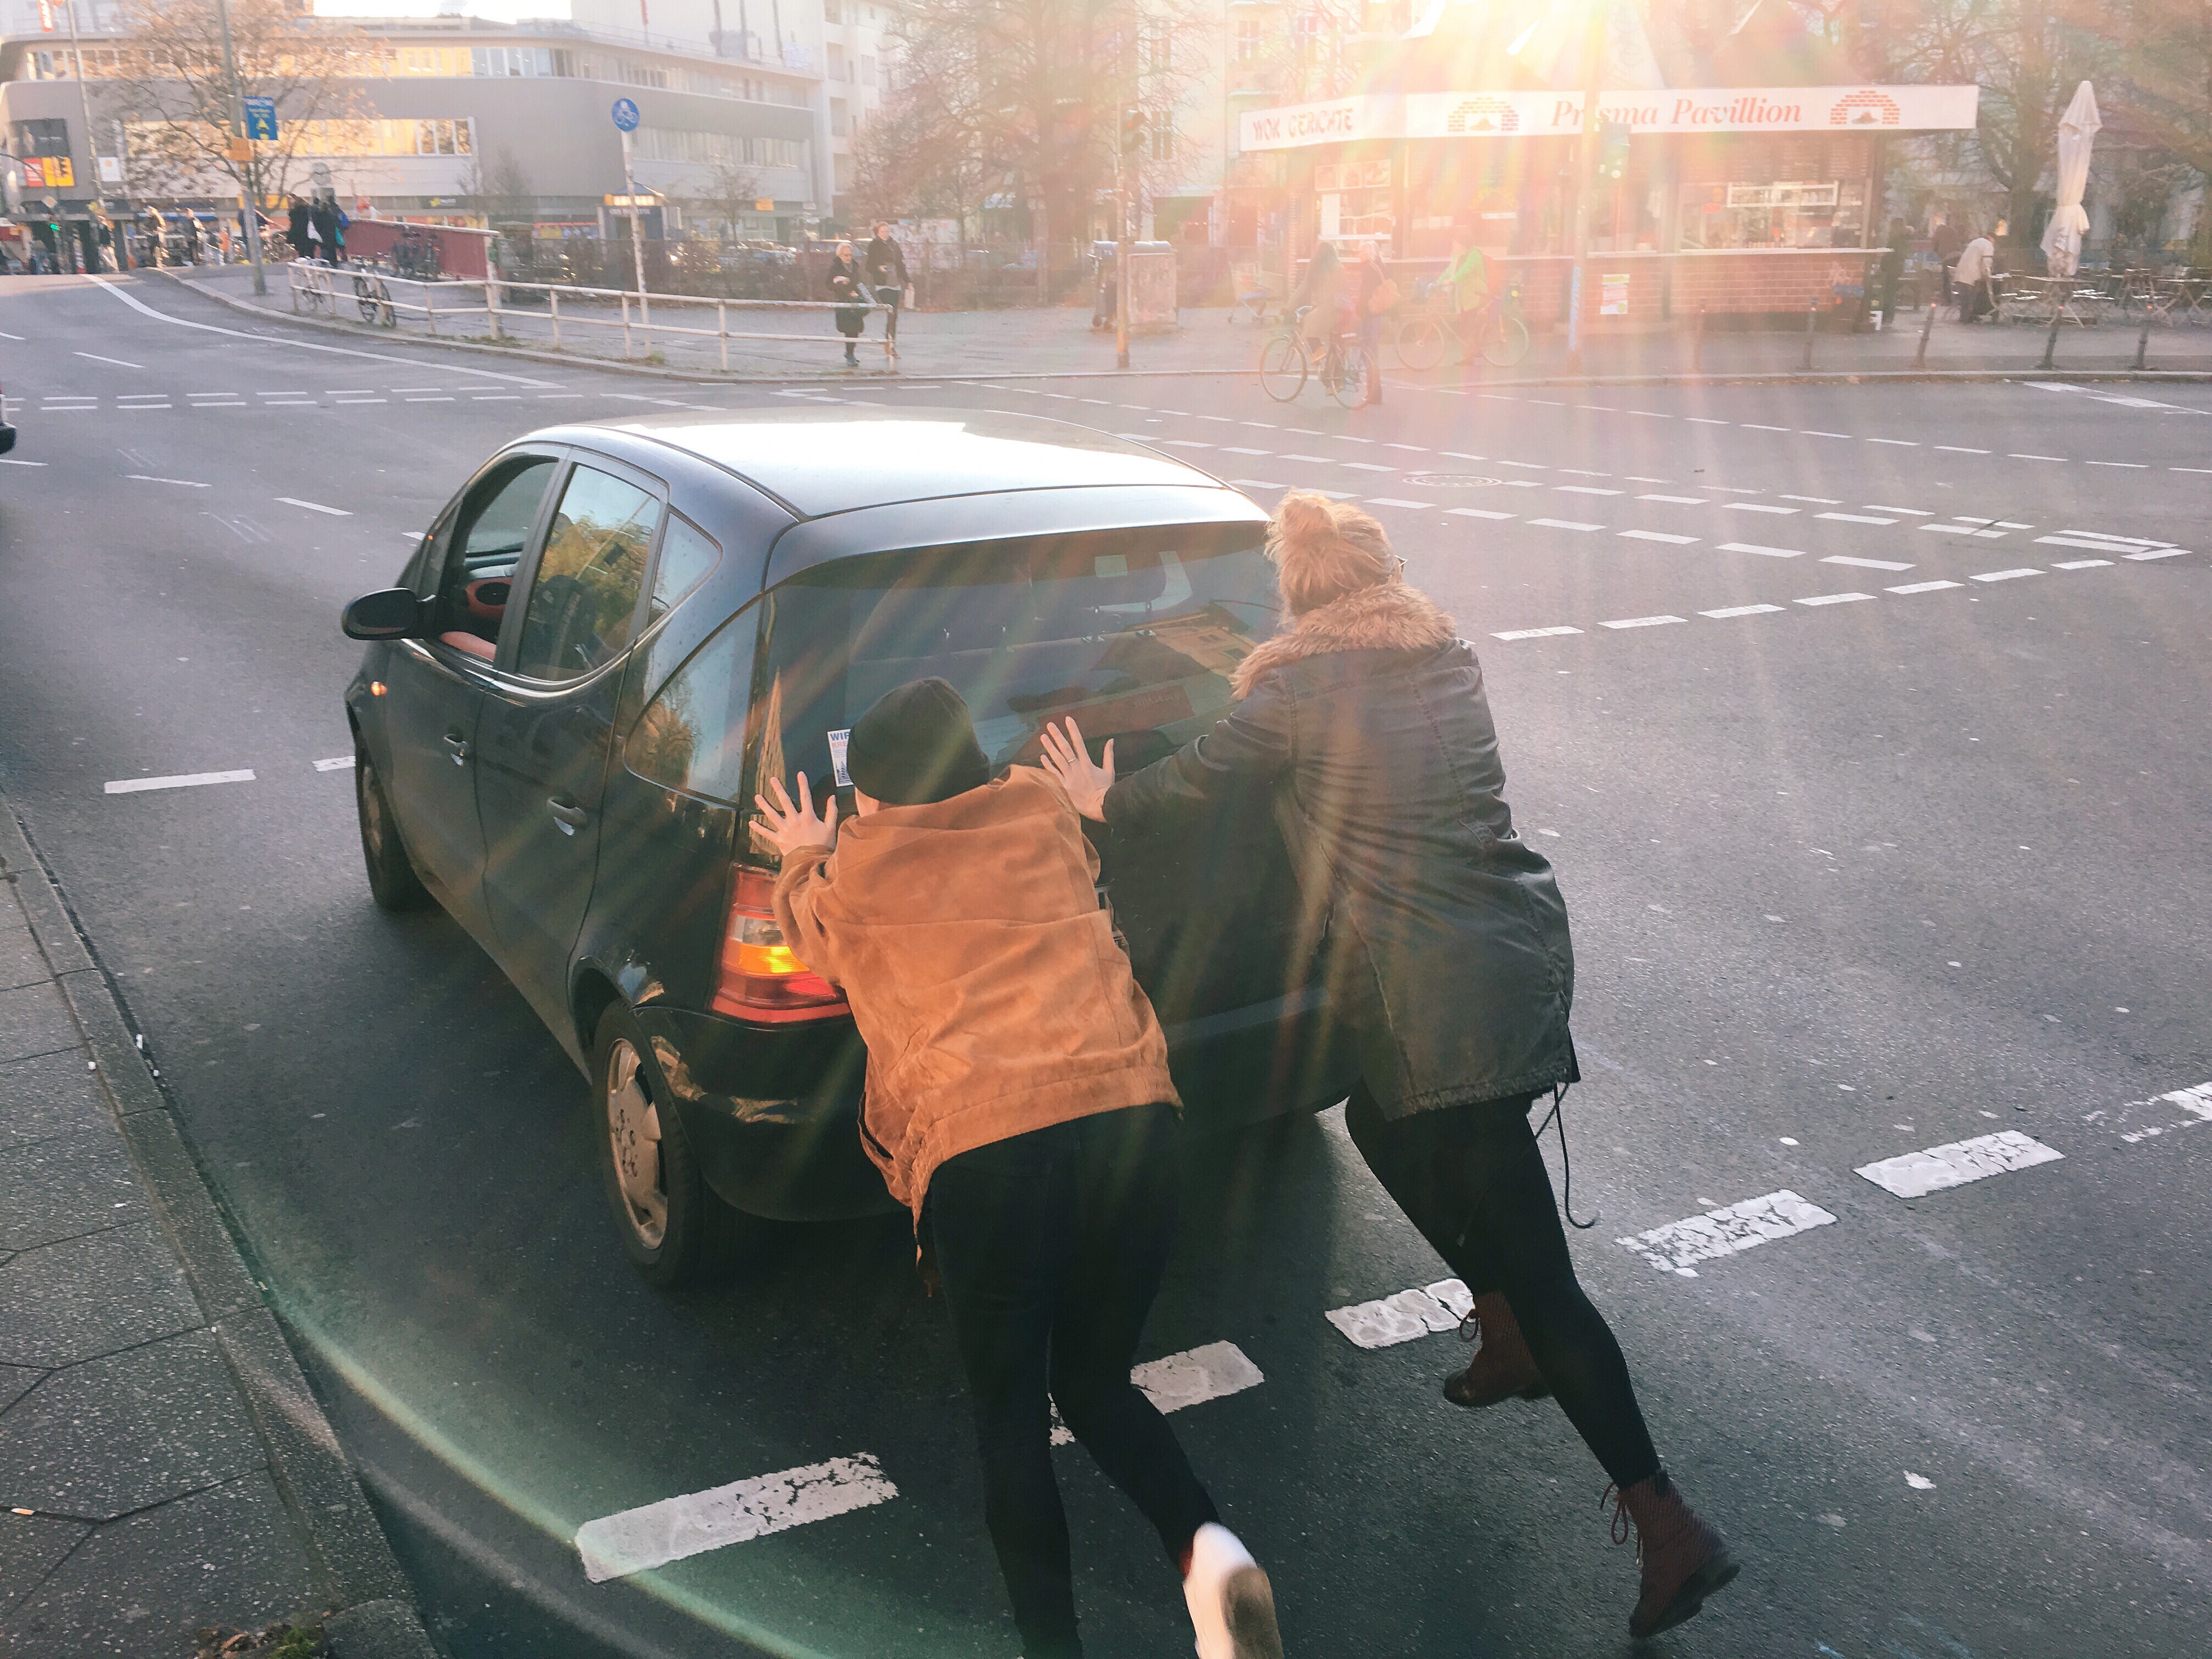 TP-women-pushing-a-car_t20_kjdaXP